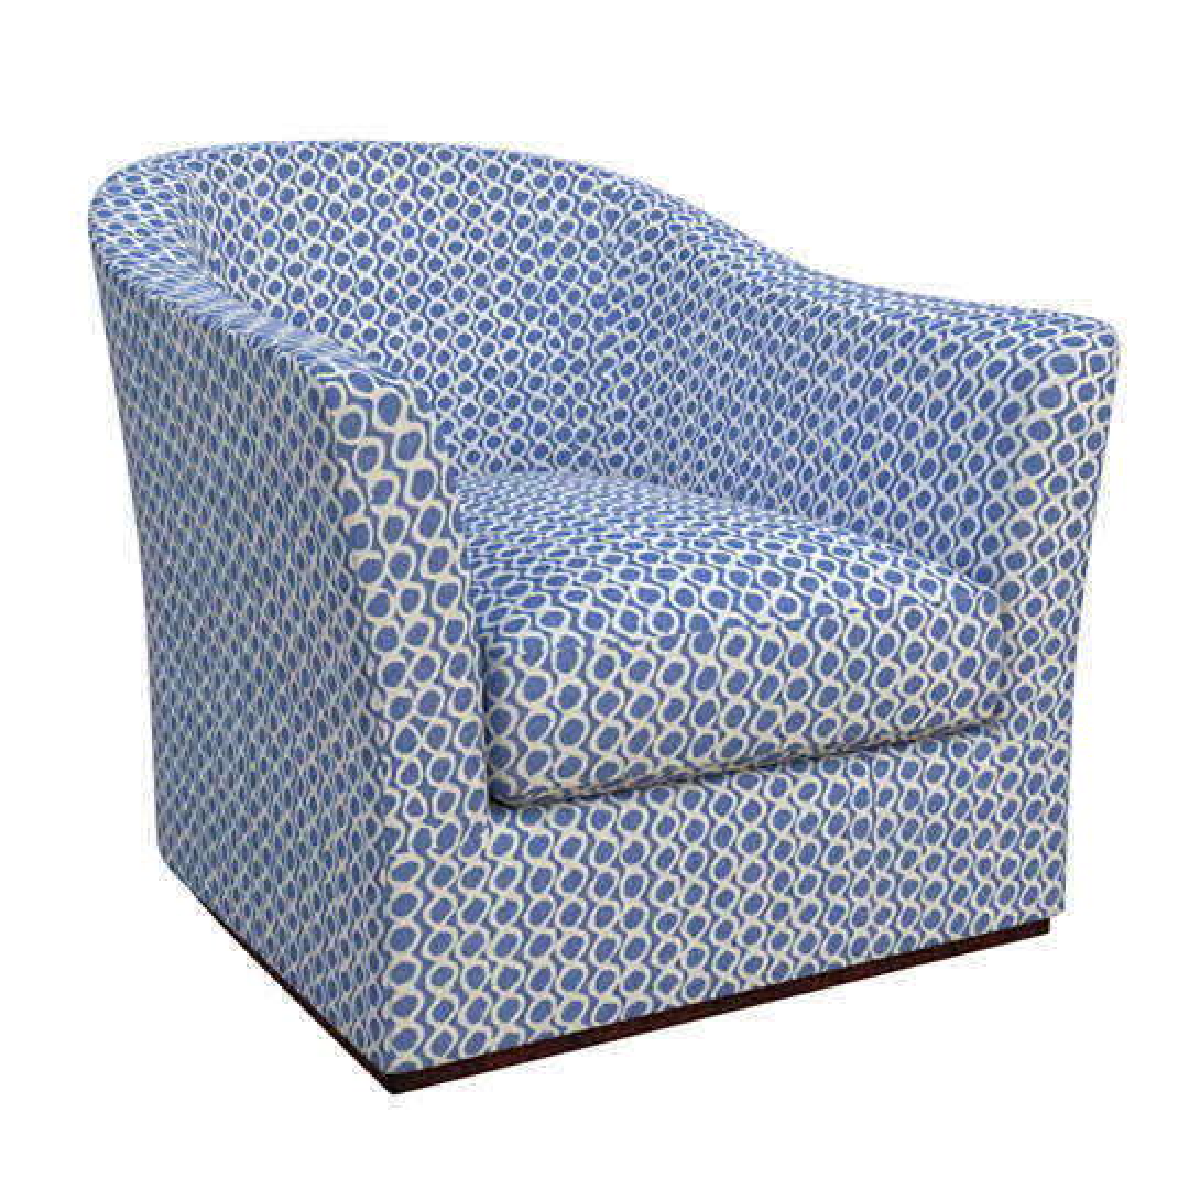 Beads Blue Thunderbird Chair